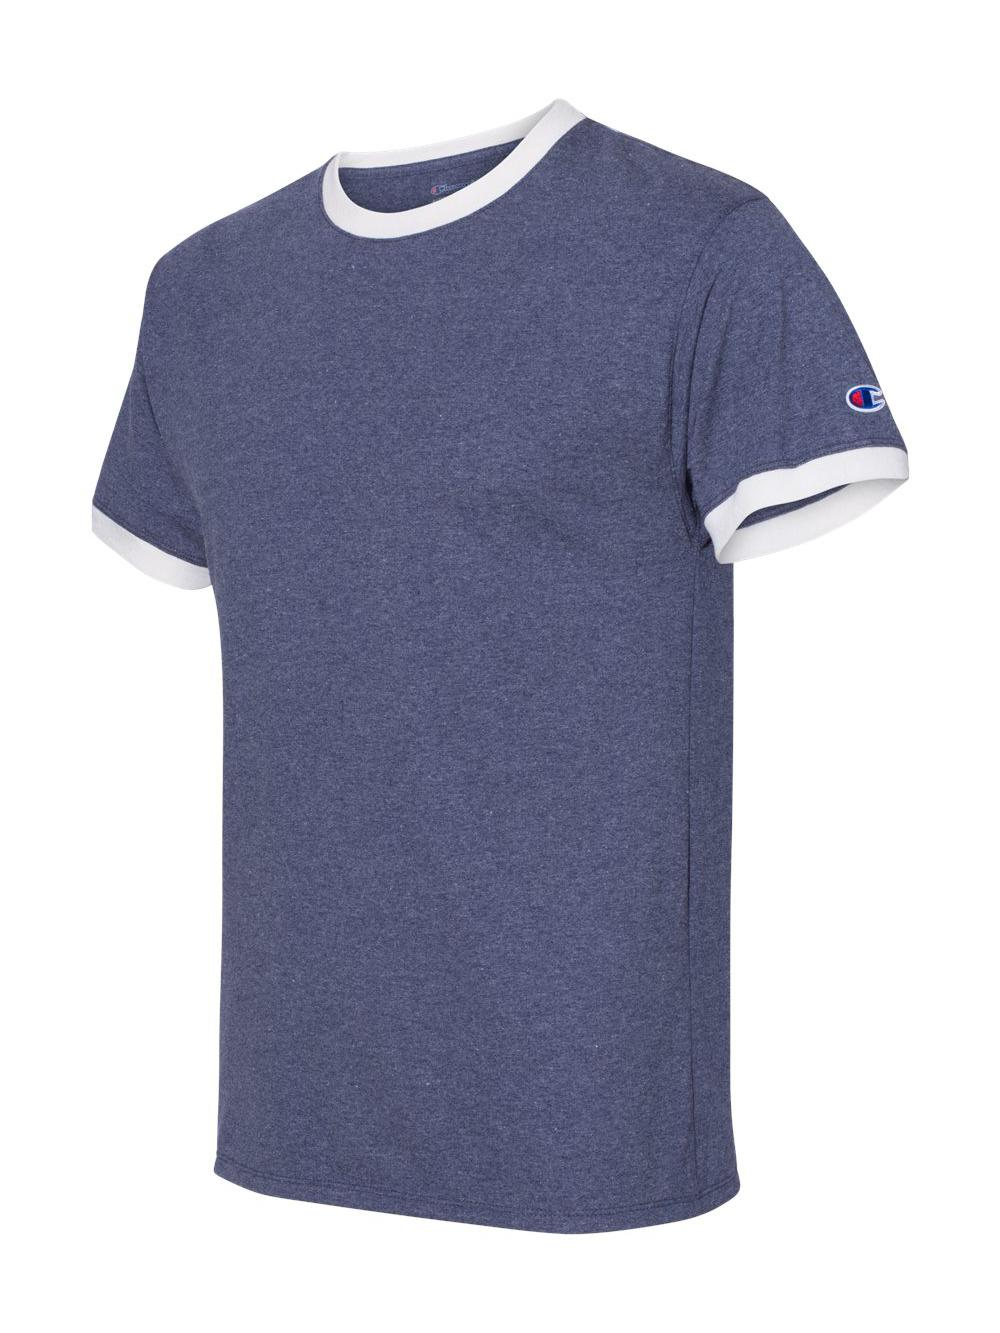 Champion-Premium-Fashion-Ringer-T-Shirt-CP65 thumbnail 16